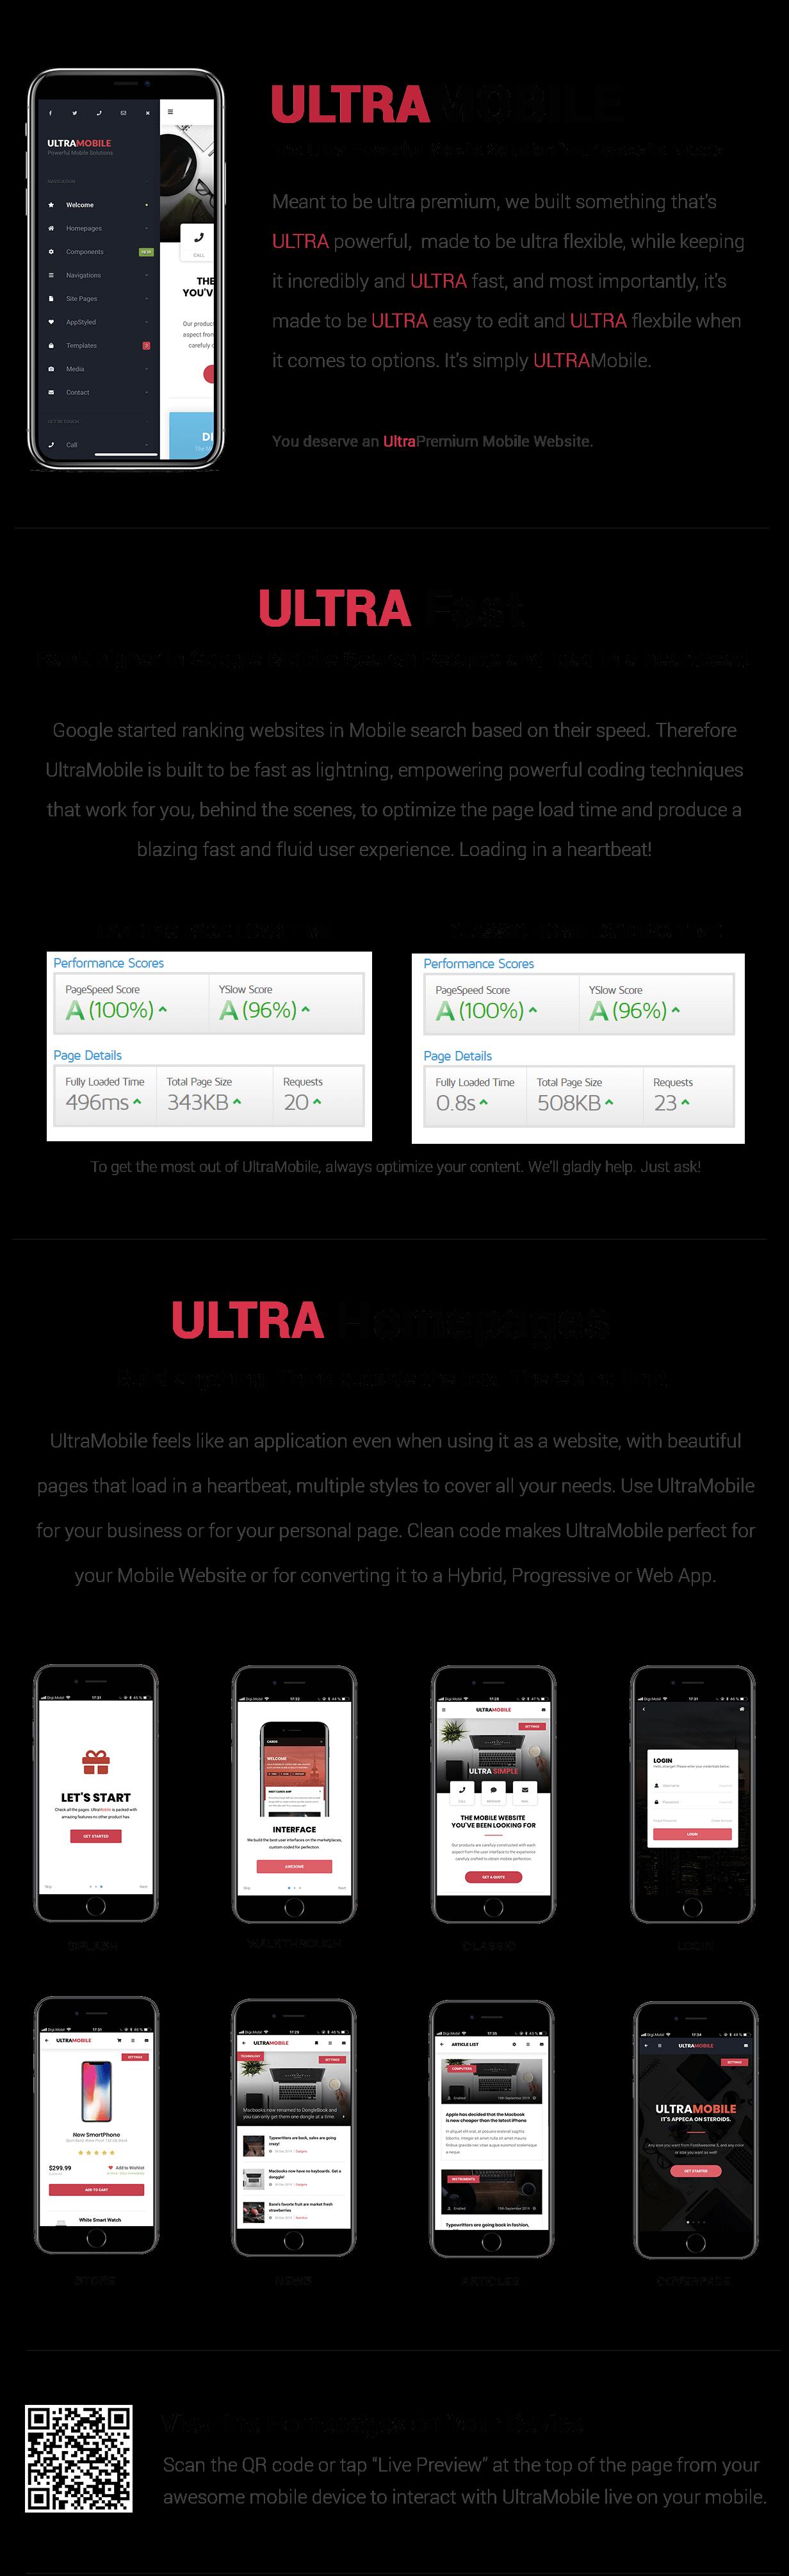 1b - Ultra Mobile